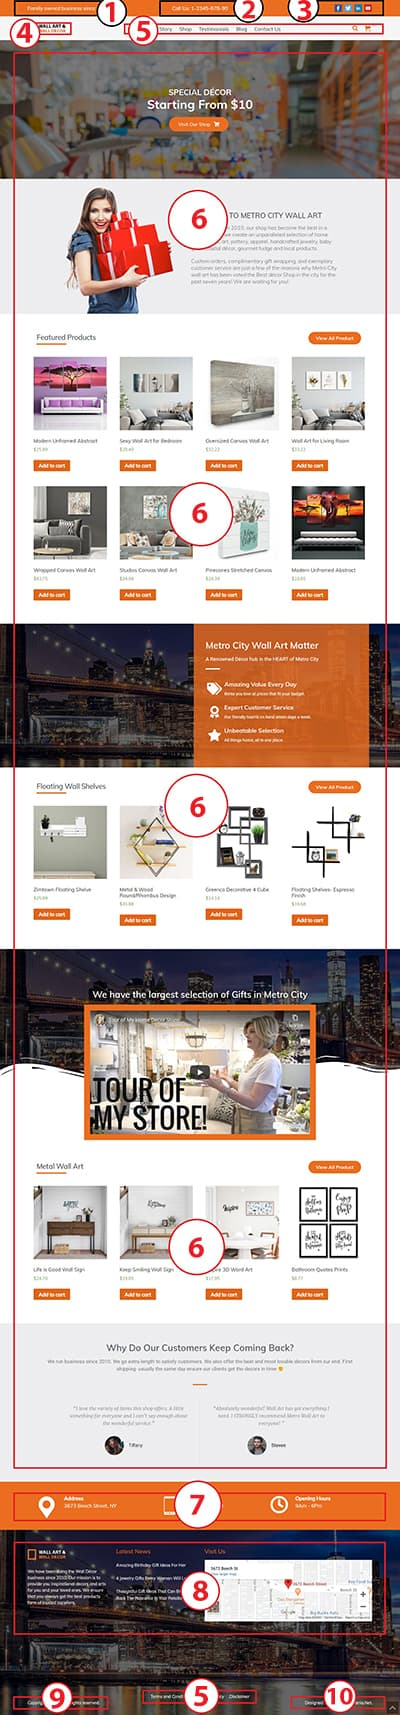 Wall Art – WordPress Theme :  Website Template For Artist Documentation